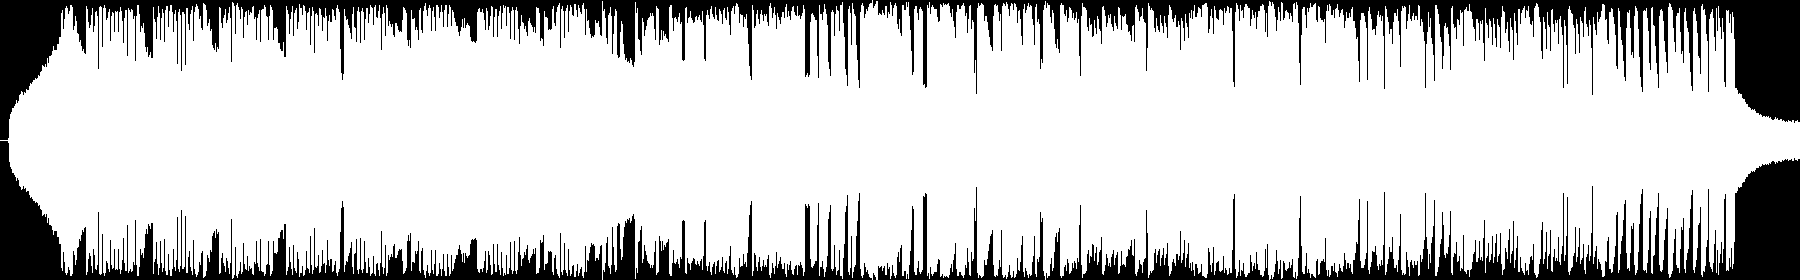 Dubstep 300 audio waveform